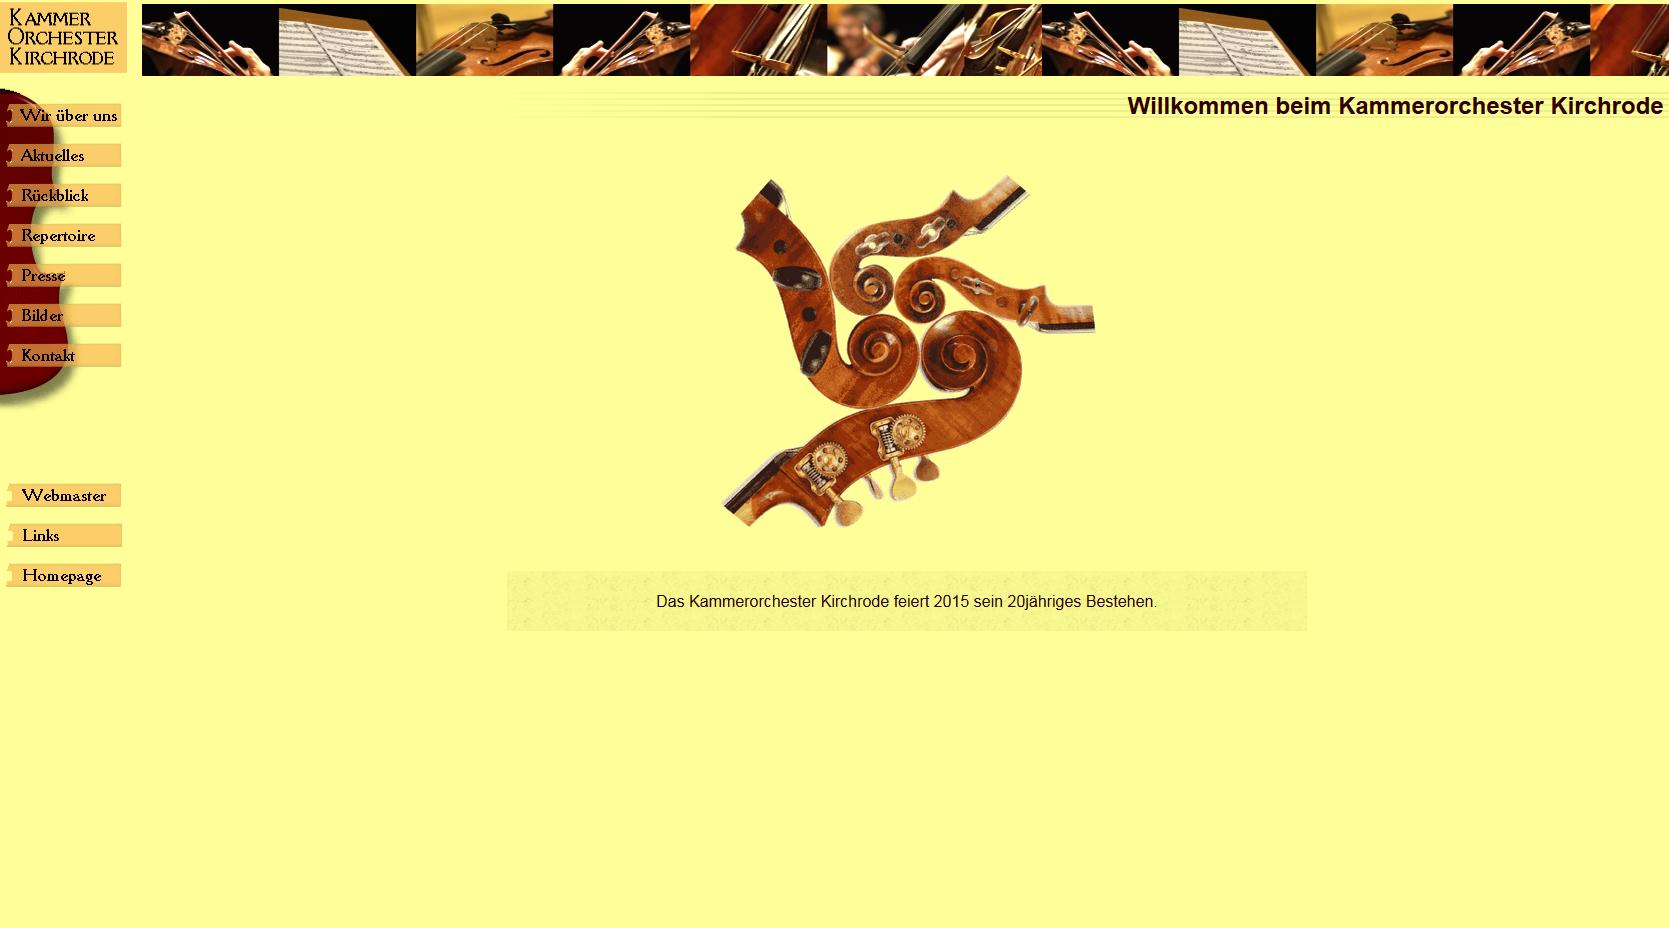 Kammerorchester-Kirchrode